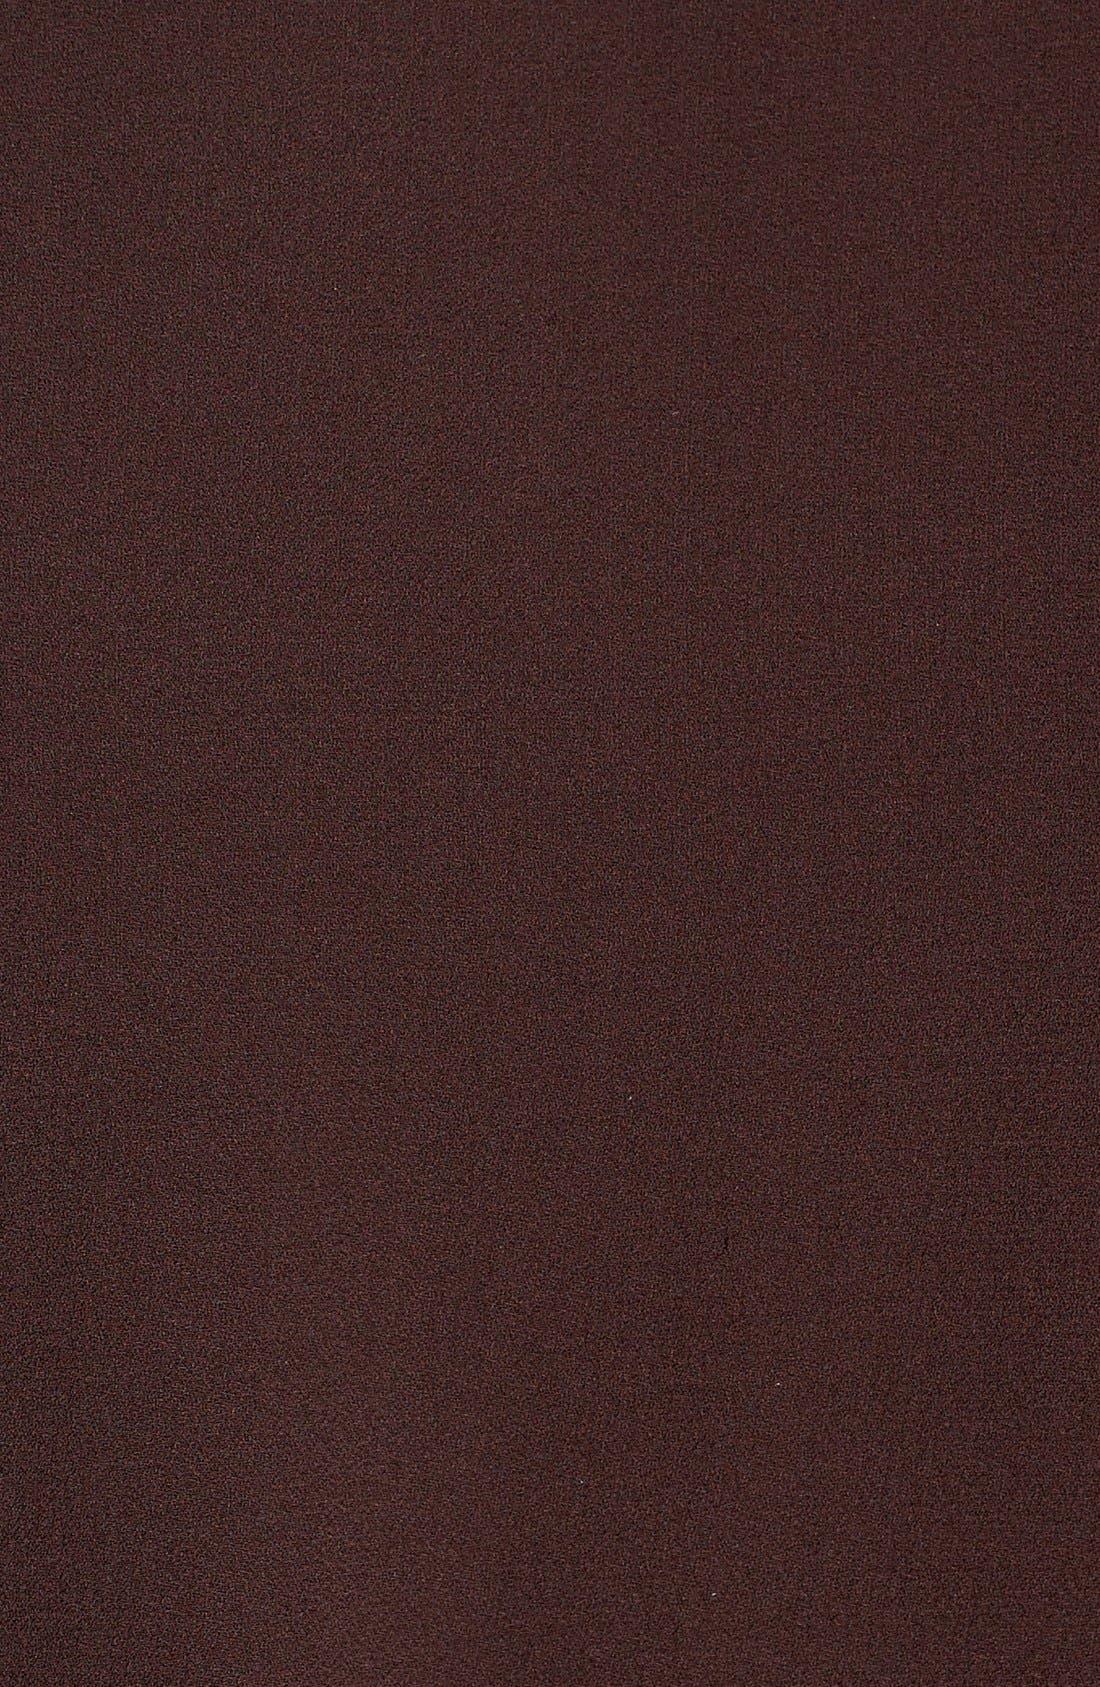 Silk Crepe High Neck Sleeveless Blouse,                             Alternate thumbnail 32, color,